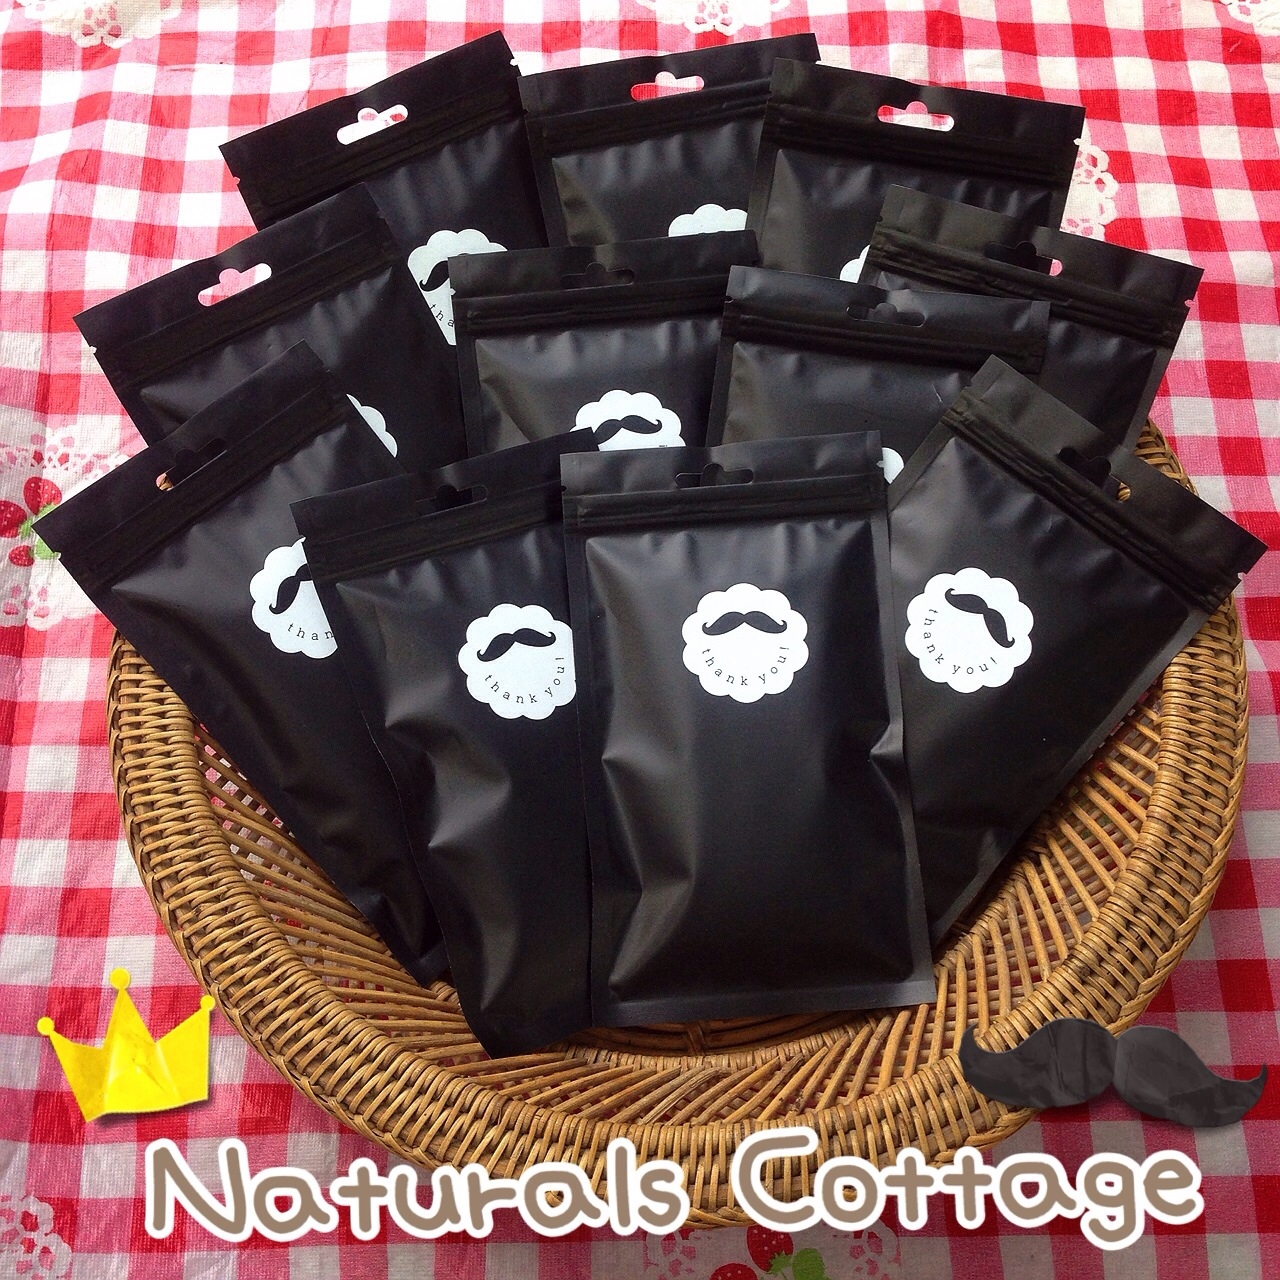 Coffee Scrub สครับกาแฟขัดผิว บอกลาผิวเปลือกส้ม & ช่วยดีท็อกซ์สารพิษ เผยผิวใหม่ที่กระจ่างใสเนียนนุ่มอย่างเป็นธรรมชาติ